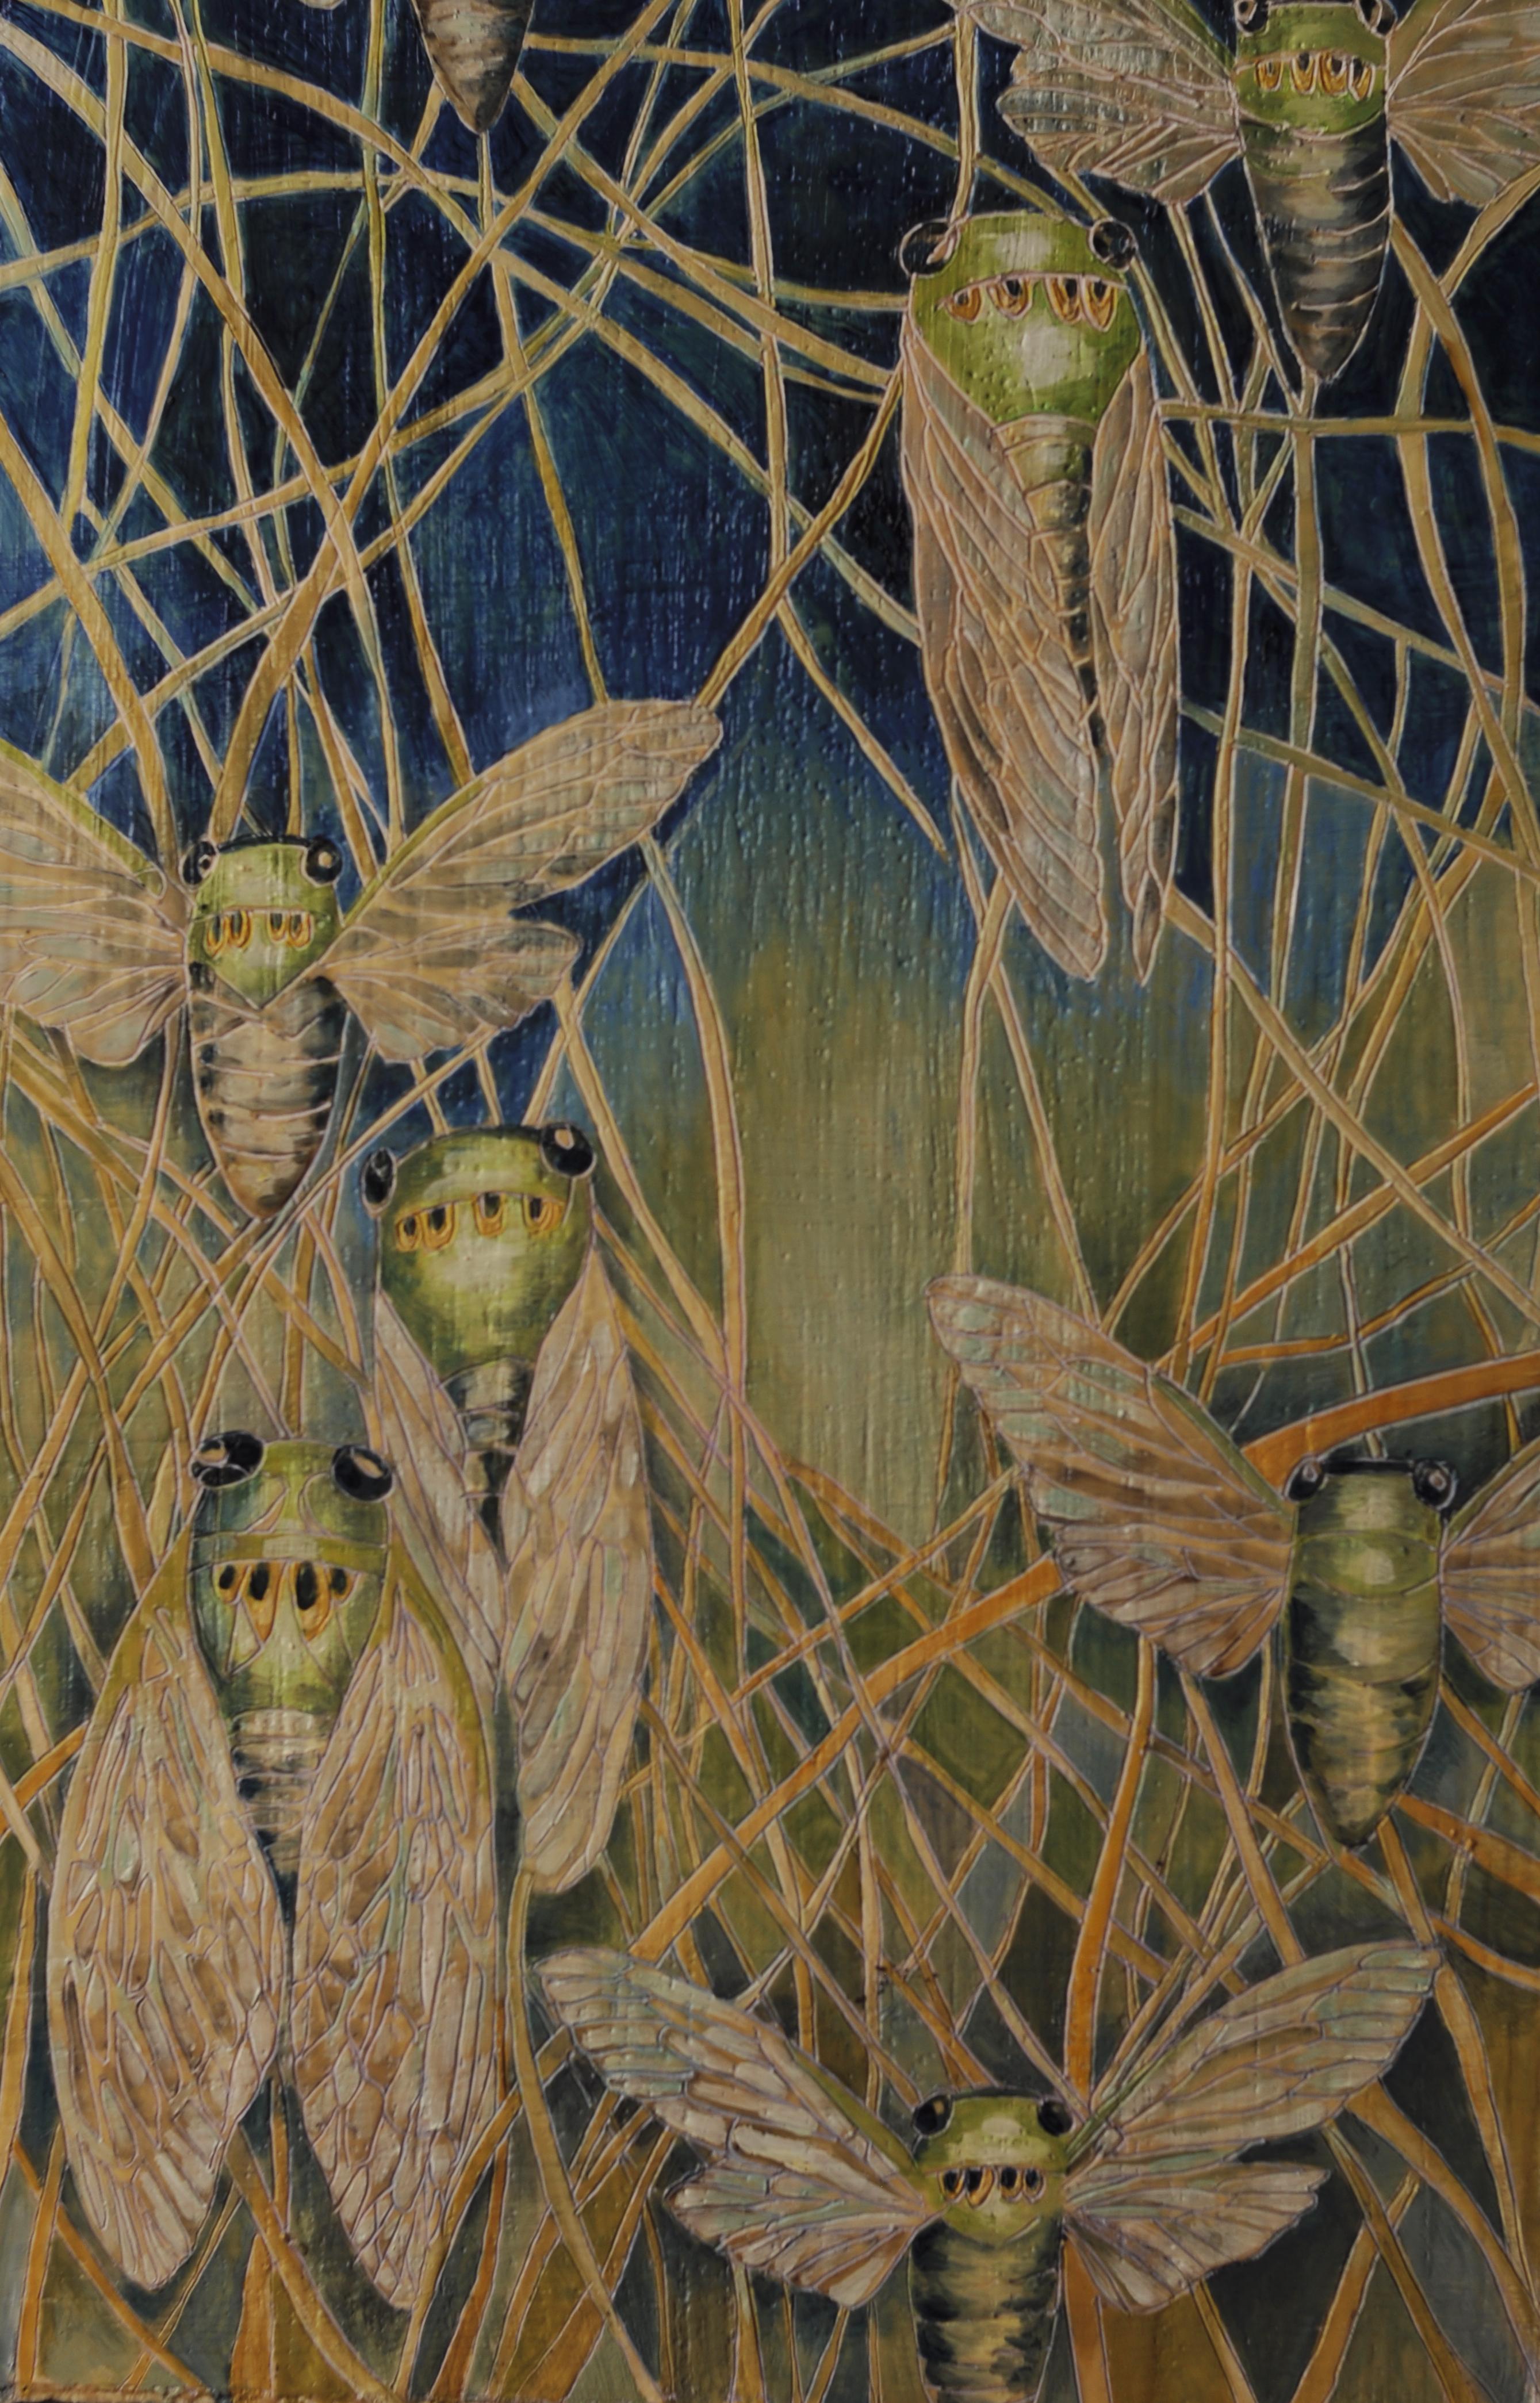 cicada with grasses